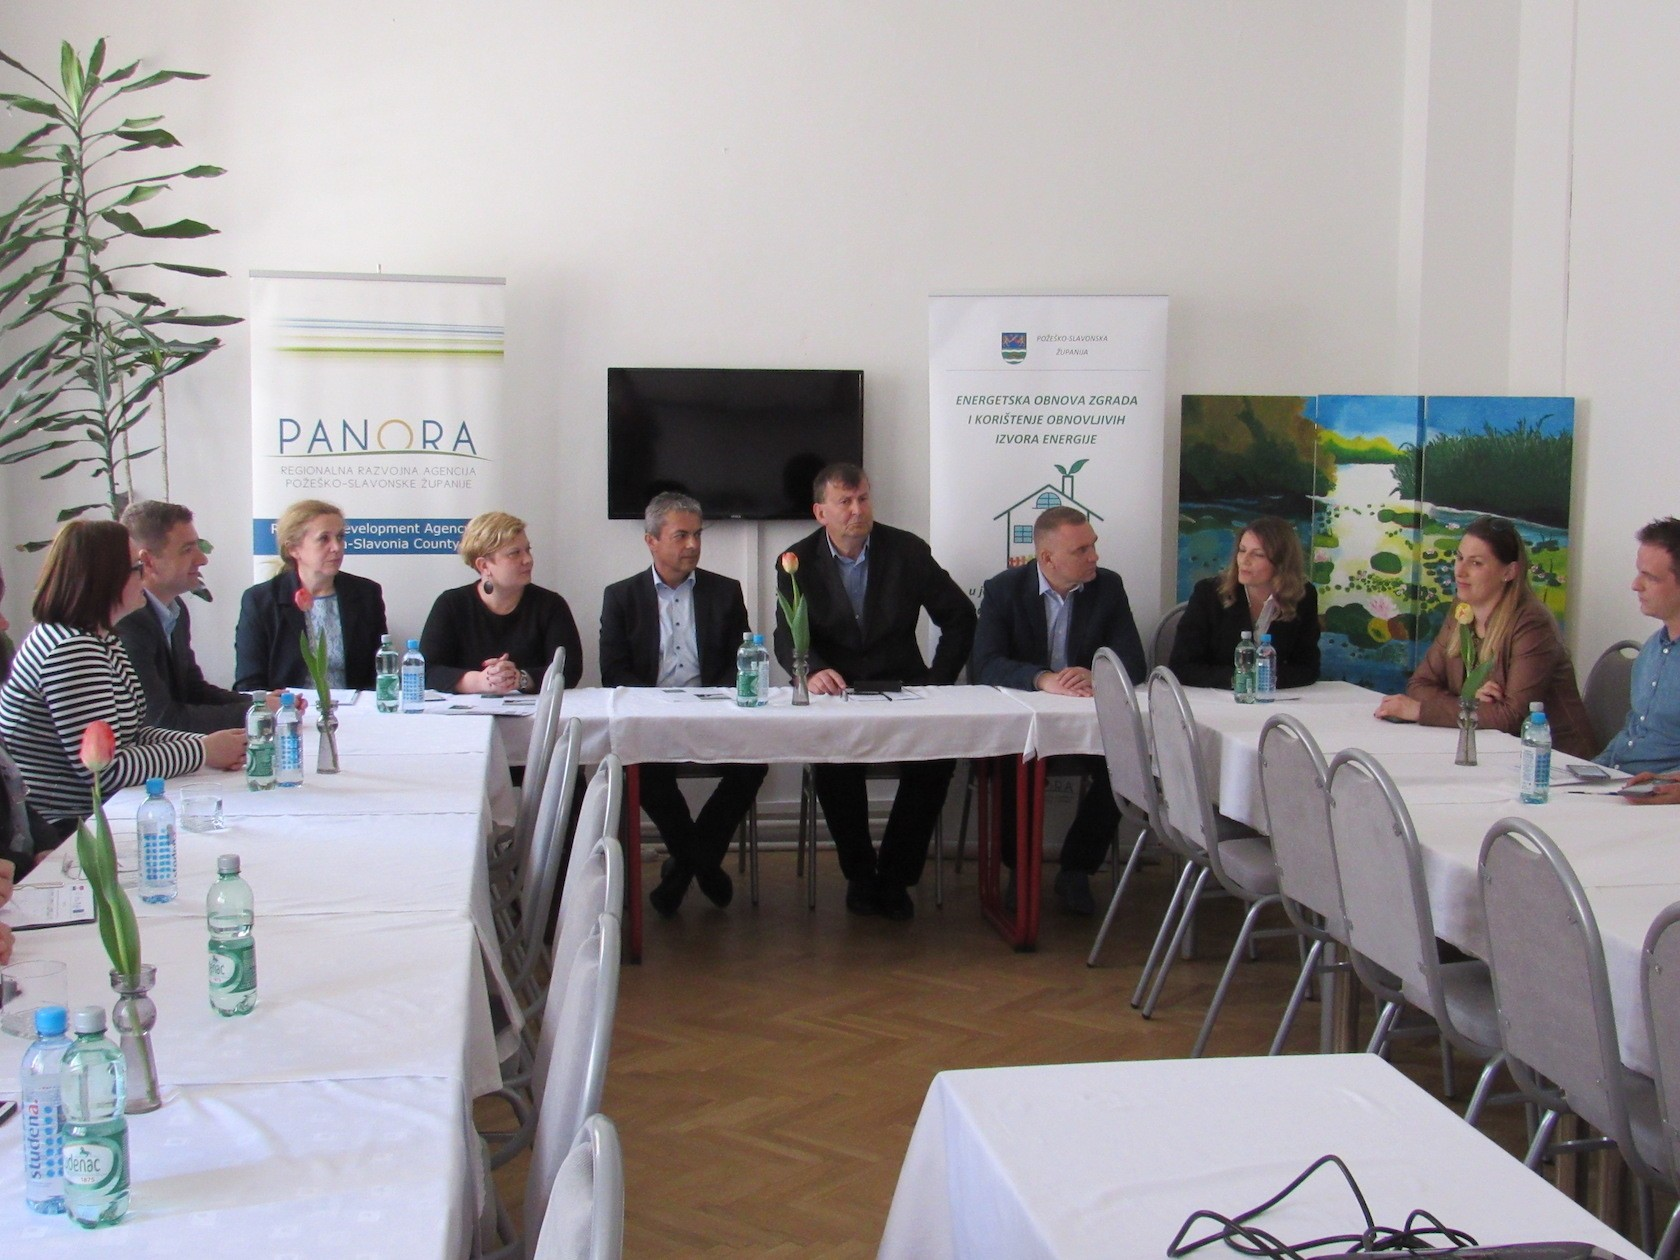 Održana početna konferencija projekta Energetska obnova zgrade Učeničkog doma Srednje škole Pakrac